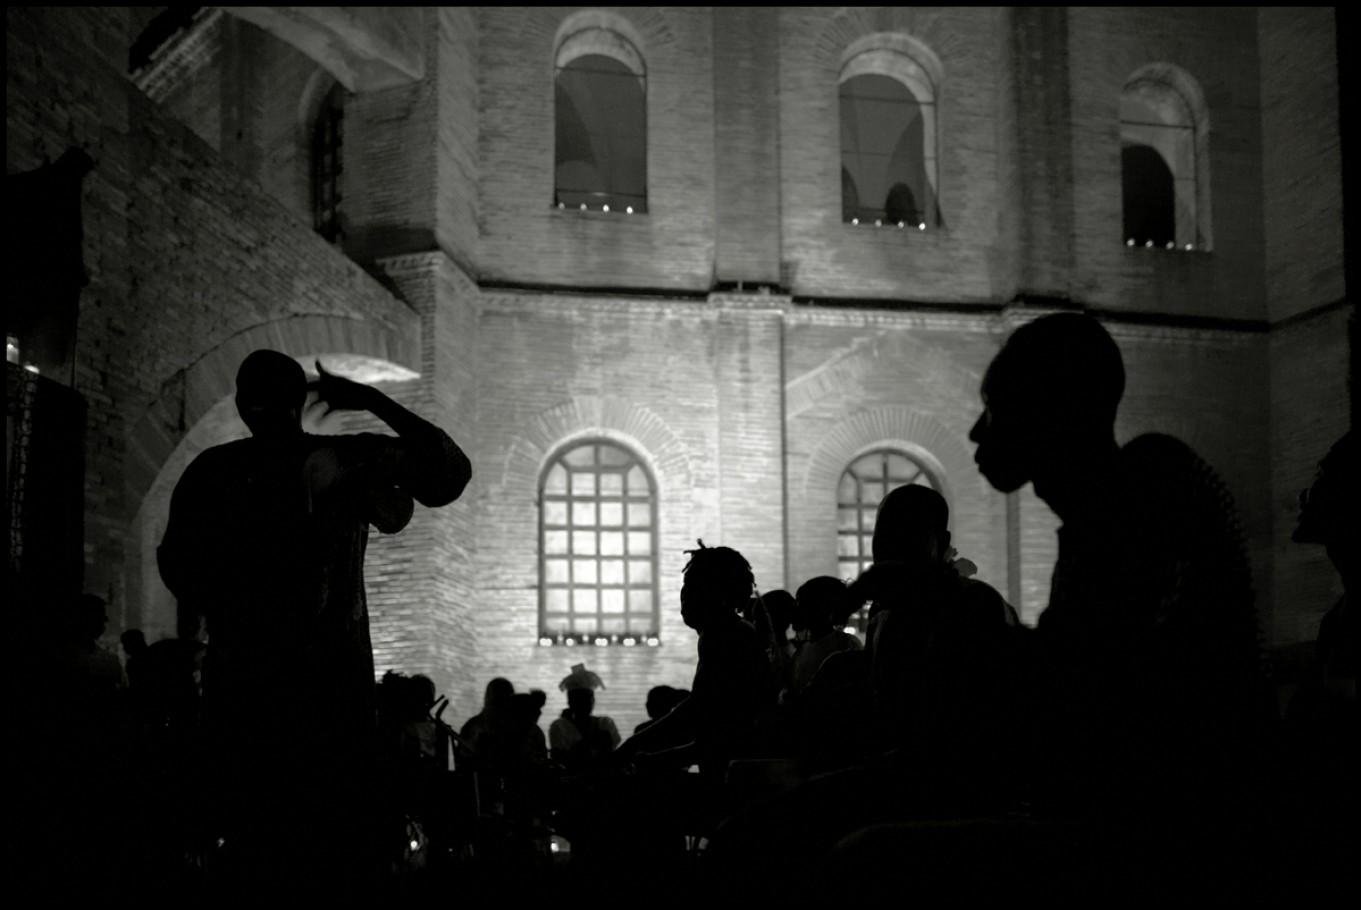 11 giugno 2010, S. Vitale, Ravenna festival